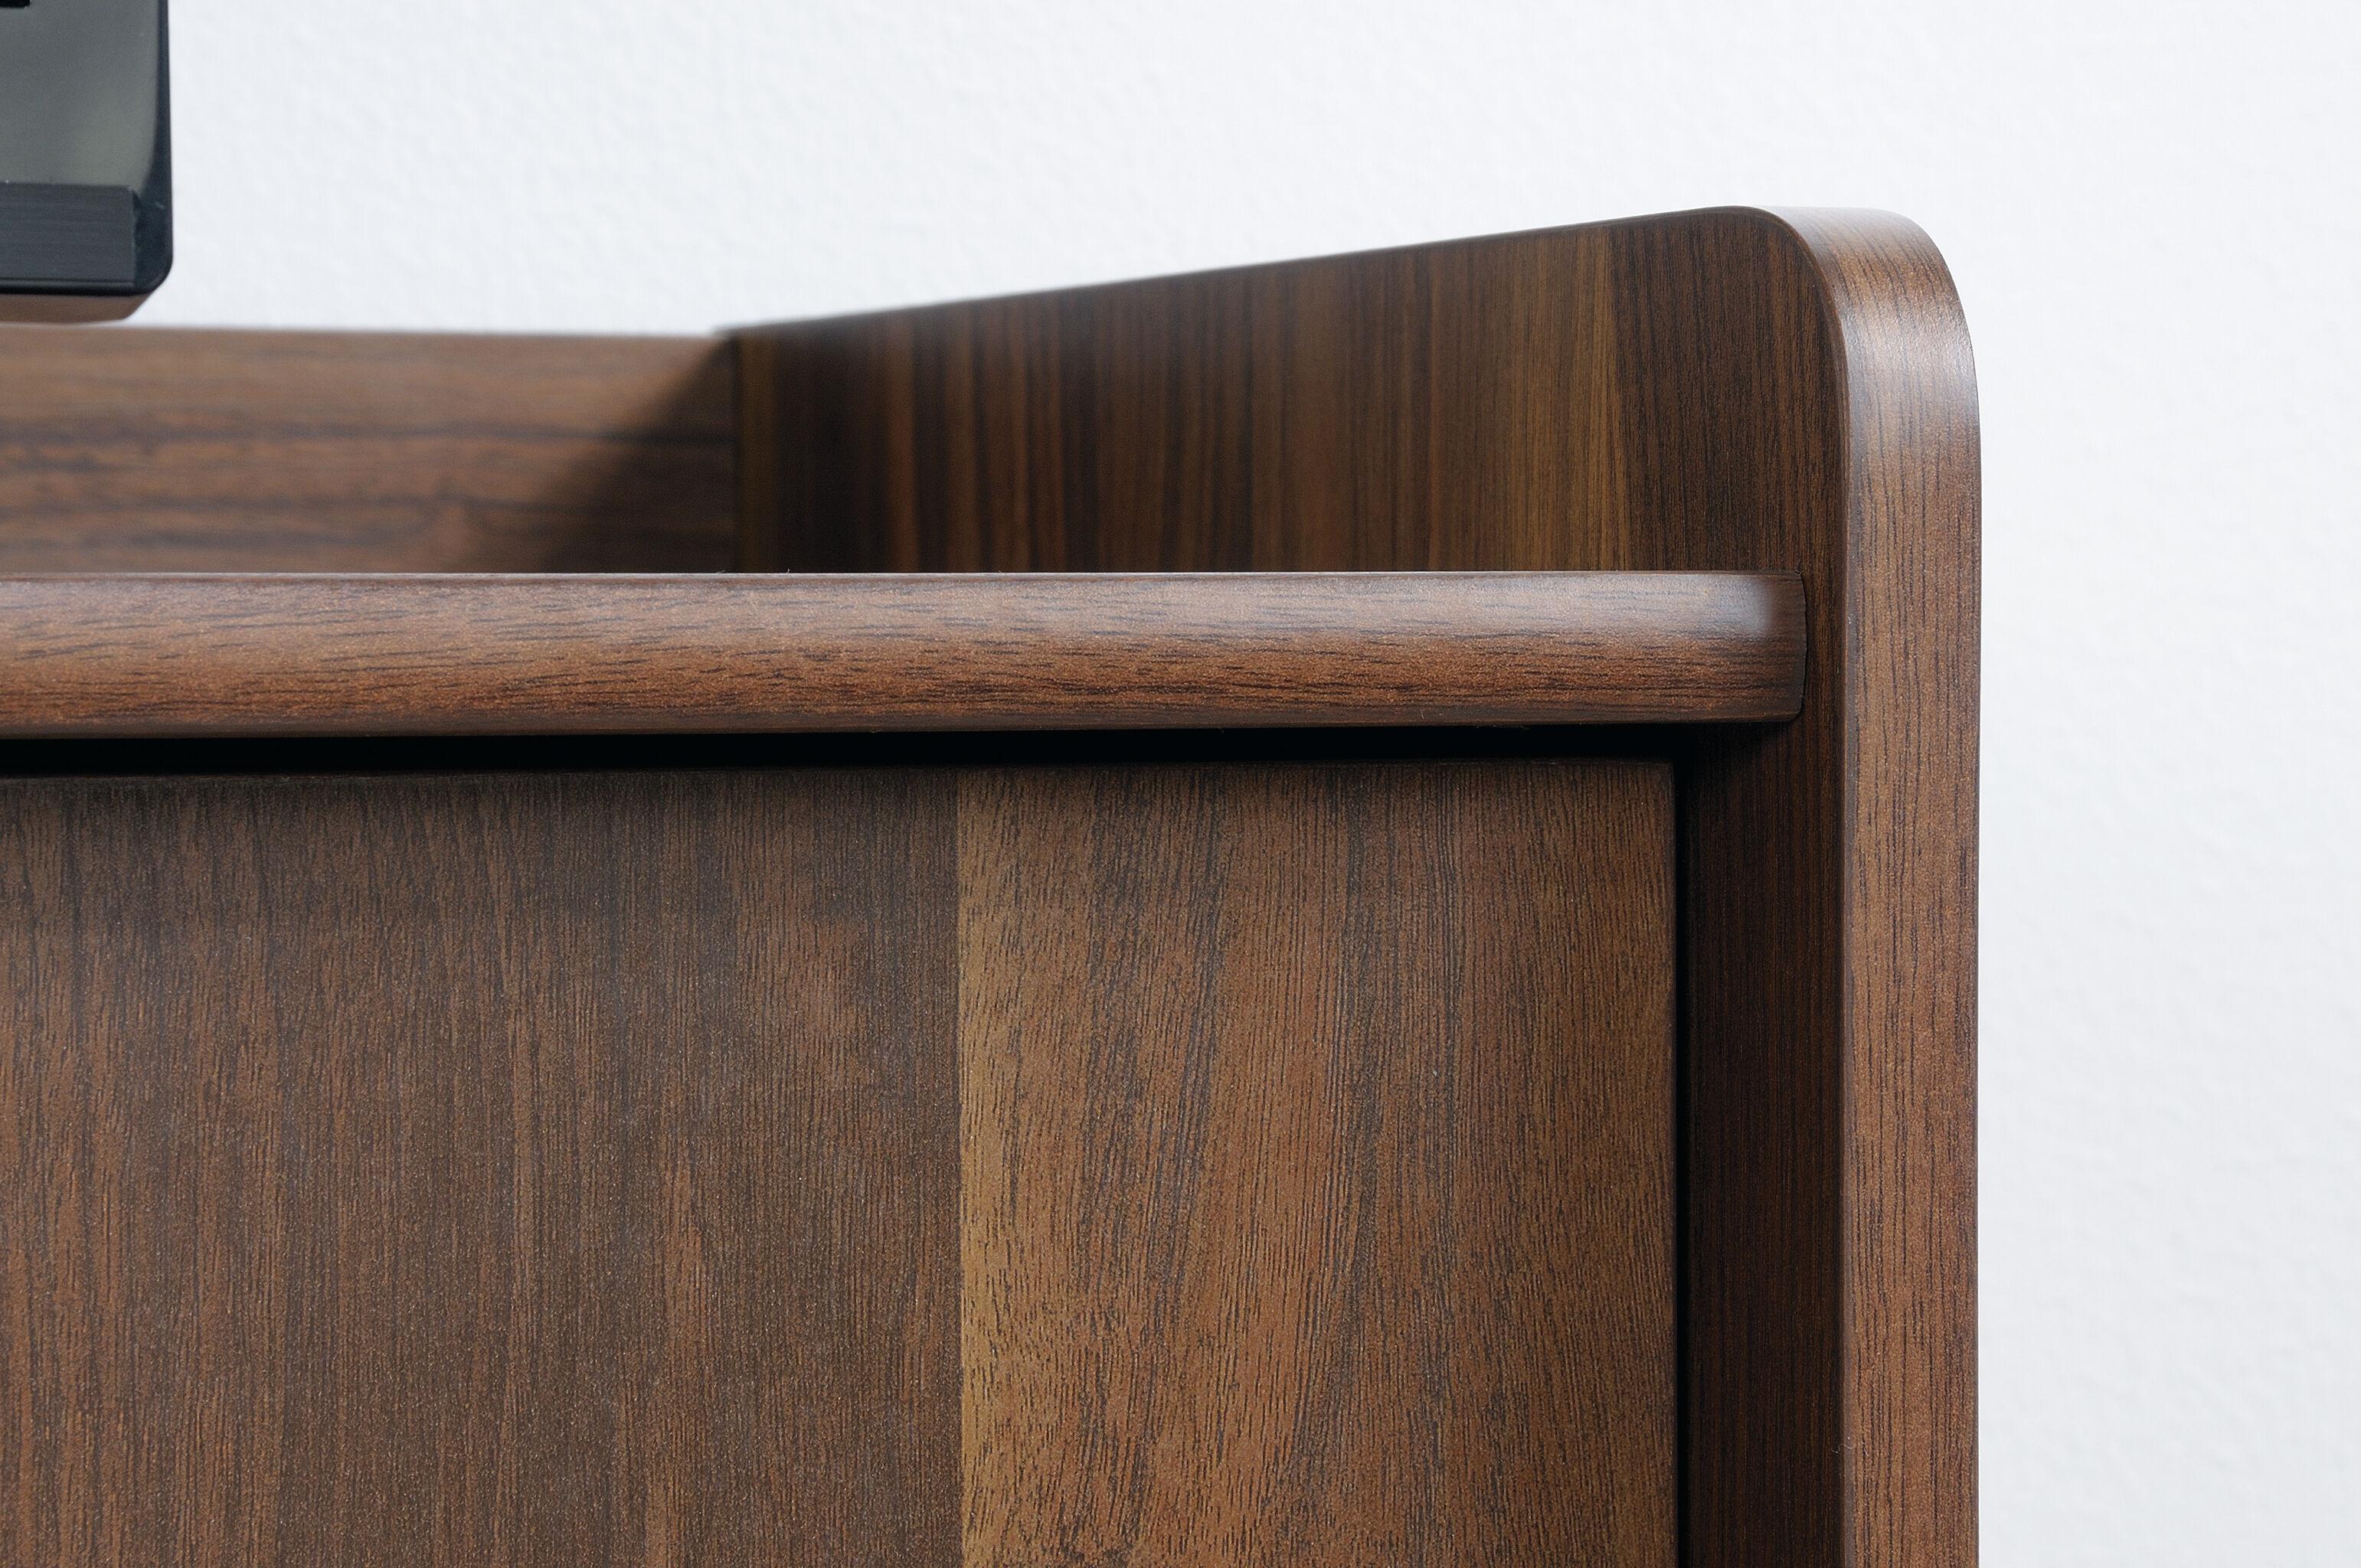 Credenza Dark Wood : Dark wood credenza minimalist in legno con ante a